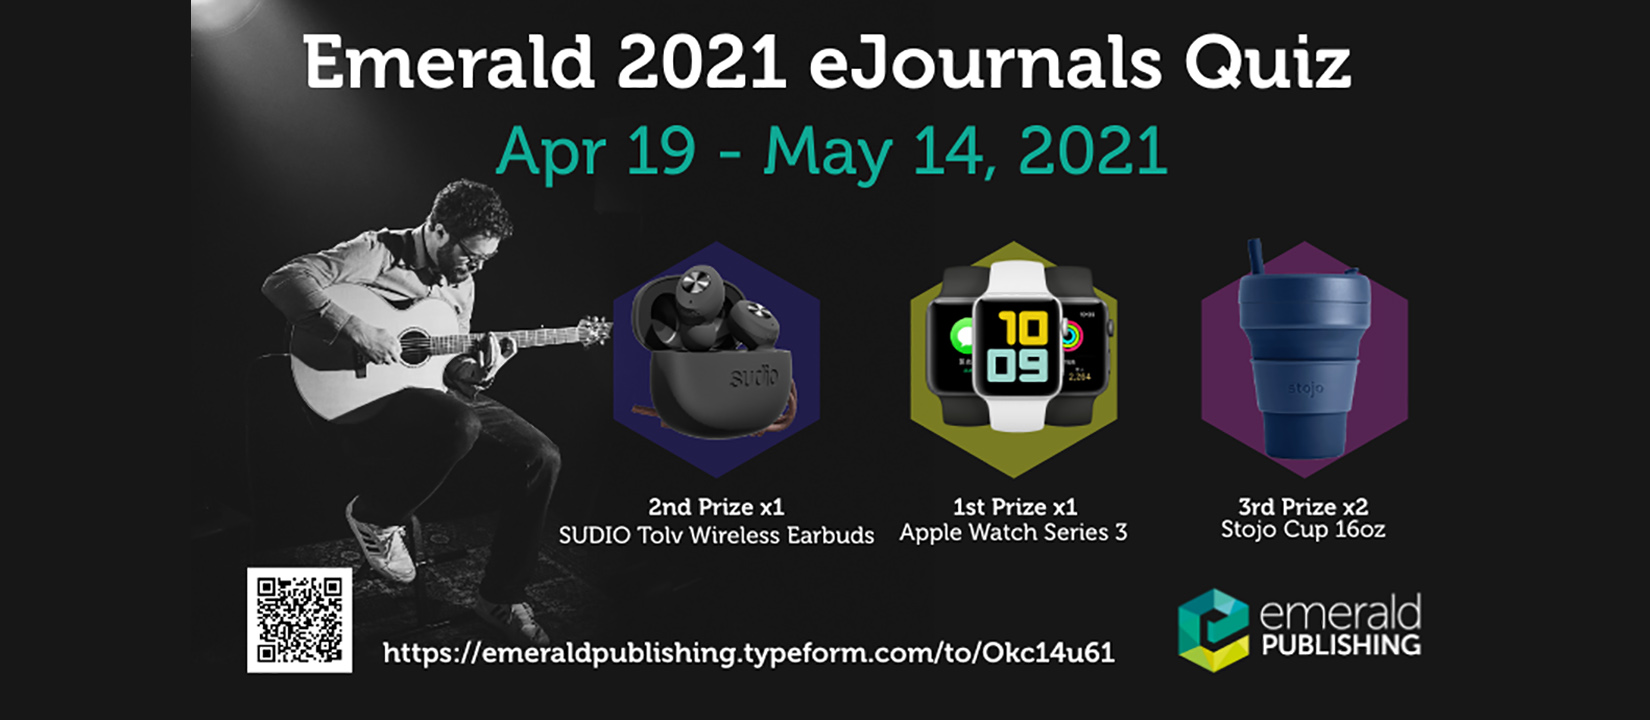 Emerald 2021 eJournal Quiz